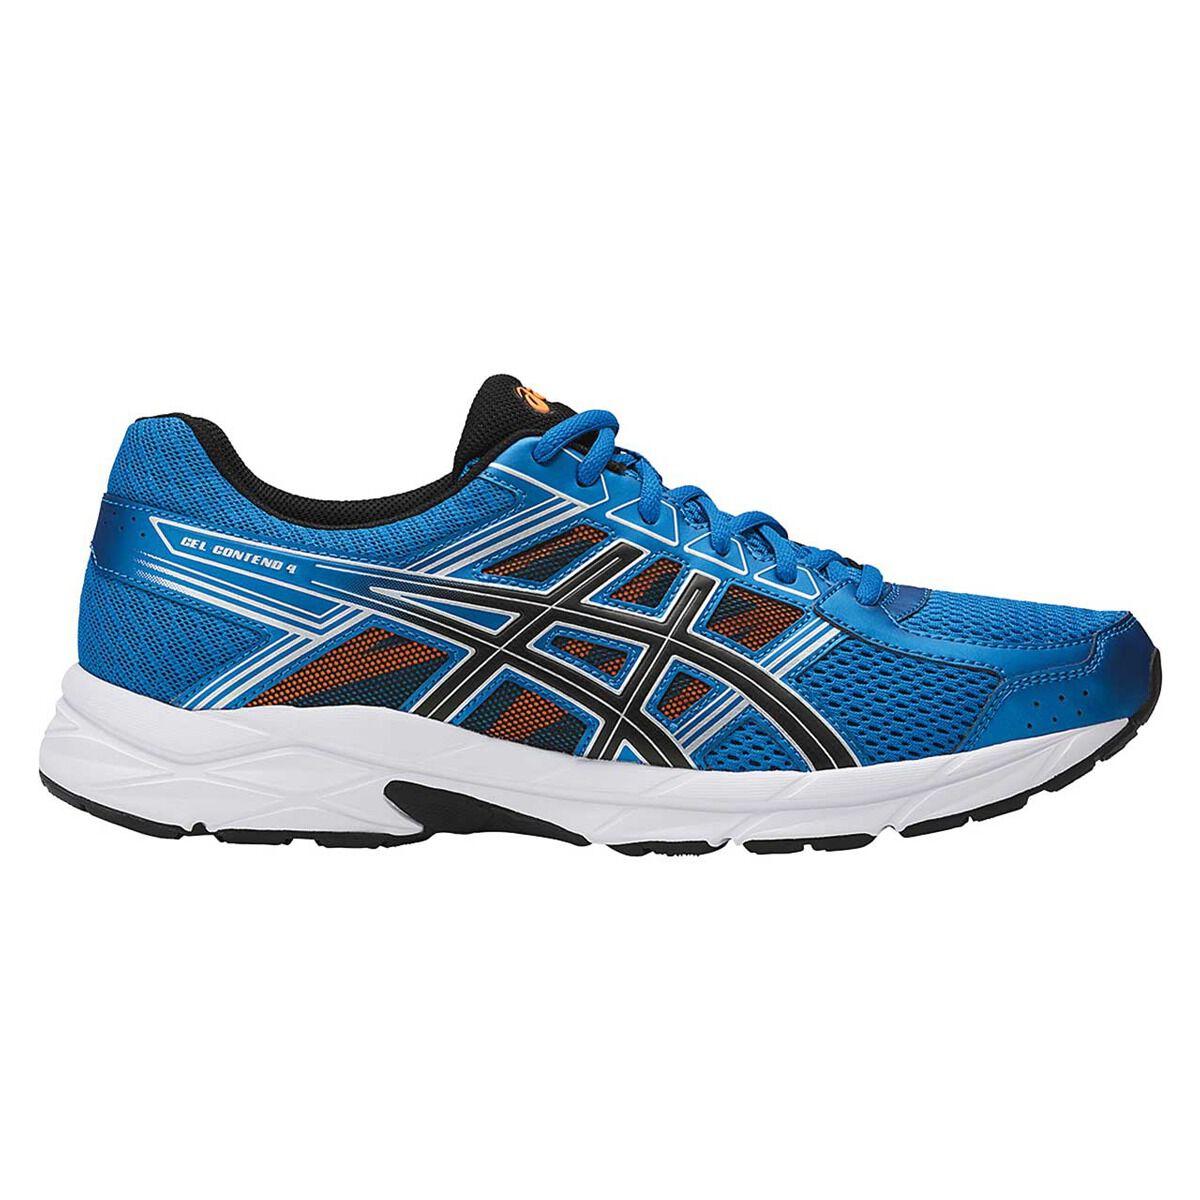 4 Rebel Gel Sport Orange Asics Contend Us Running Blue Mens Shoes 7 wEOBOv6q